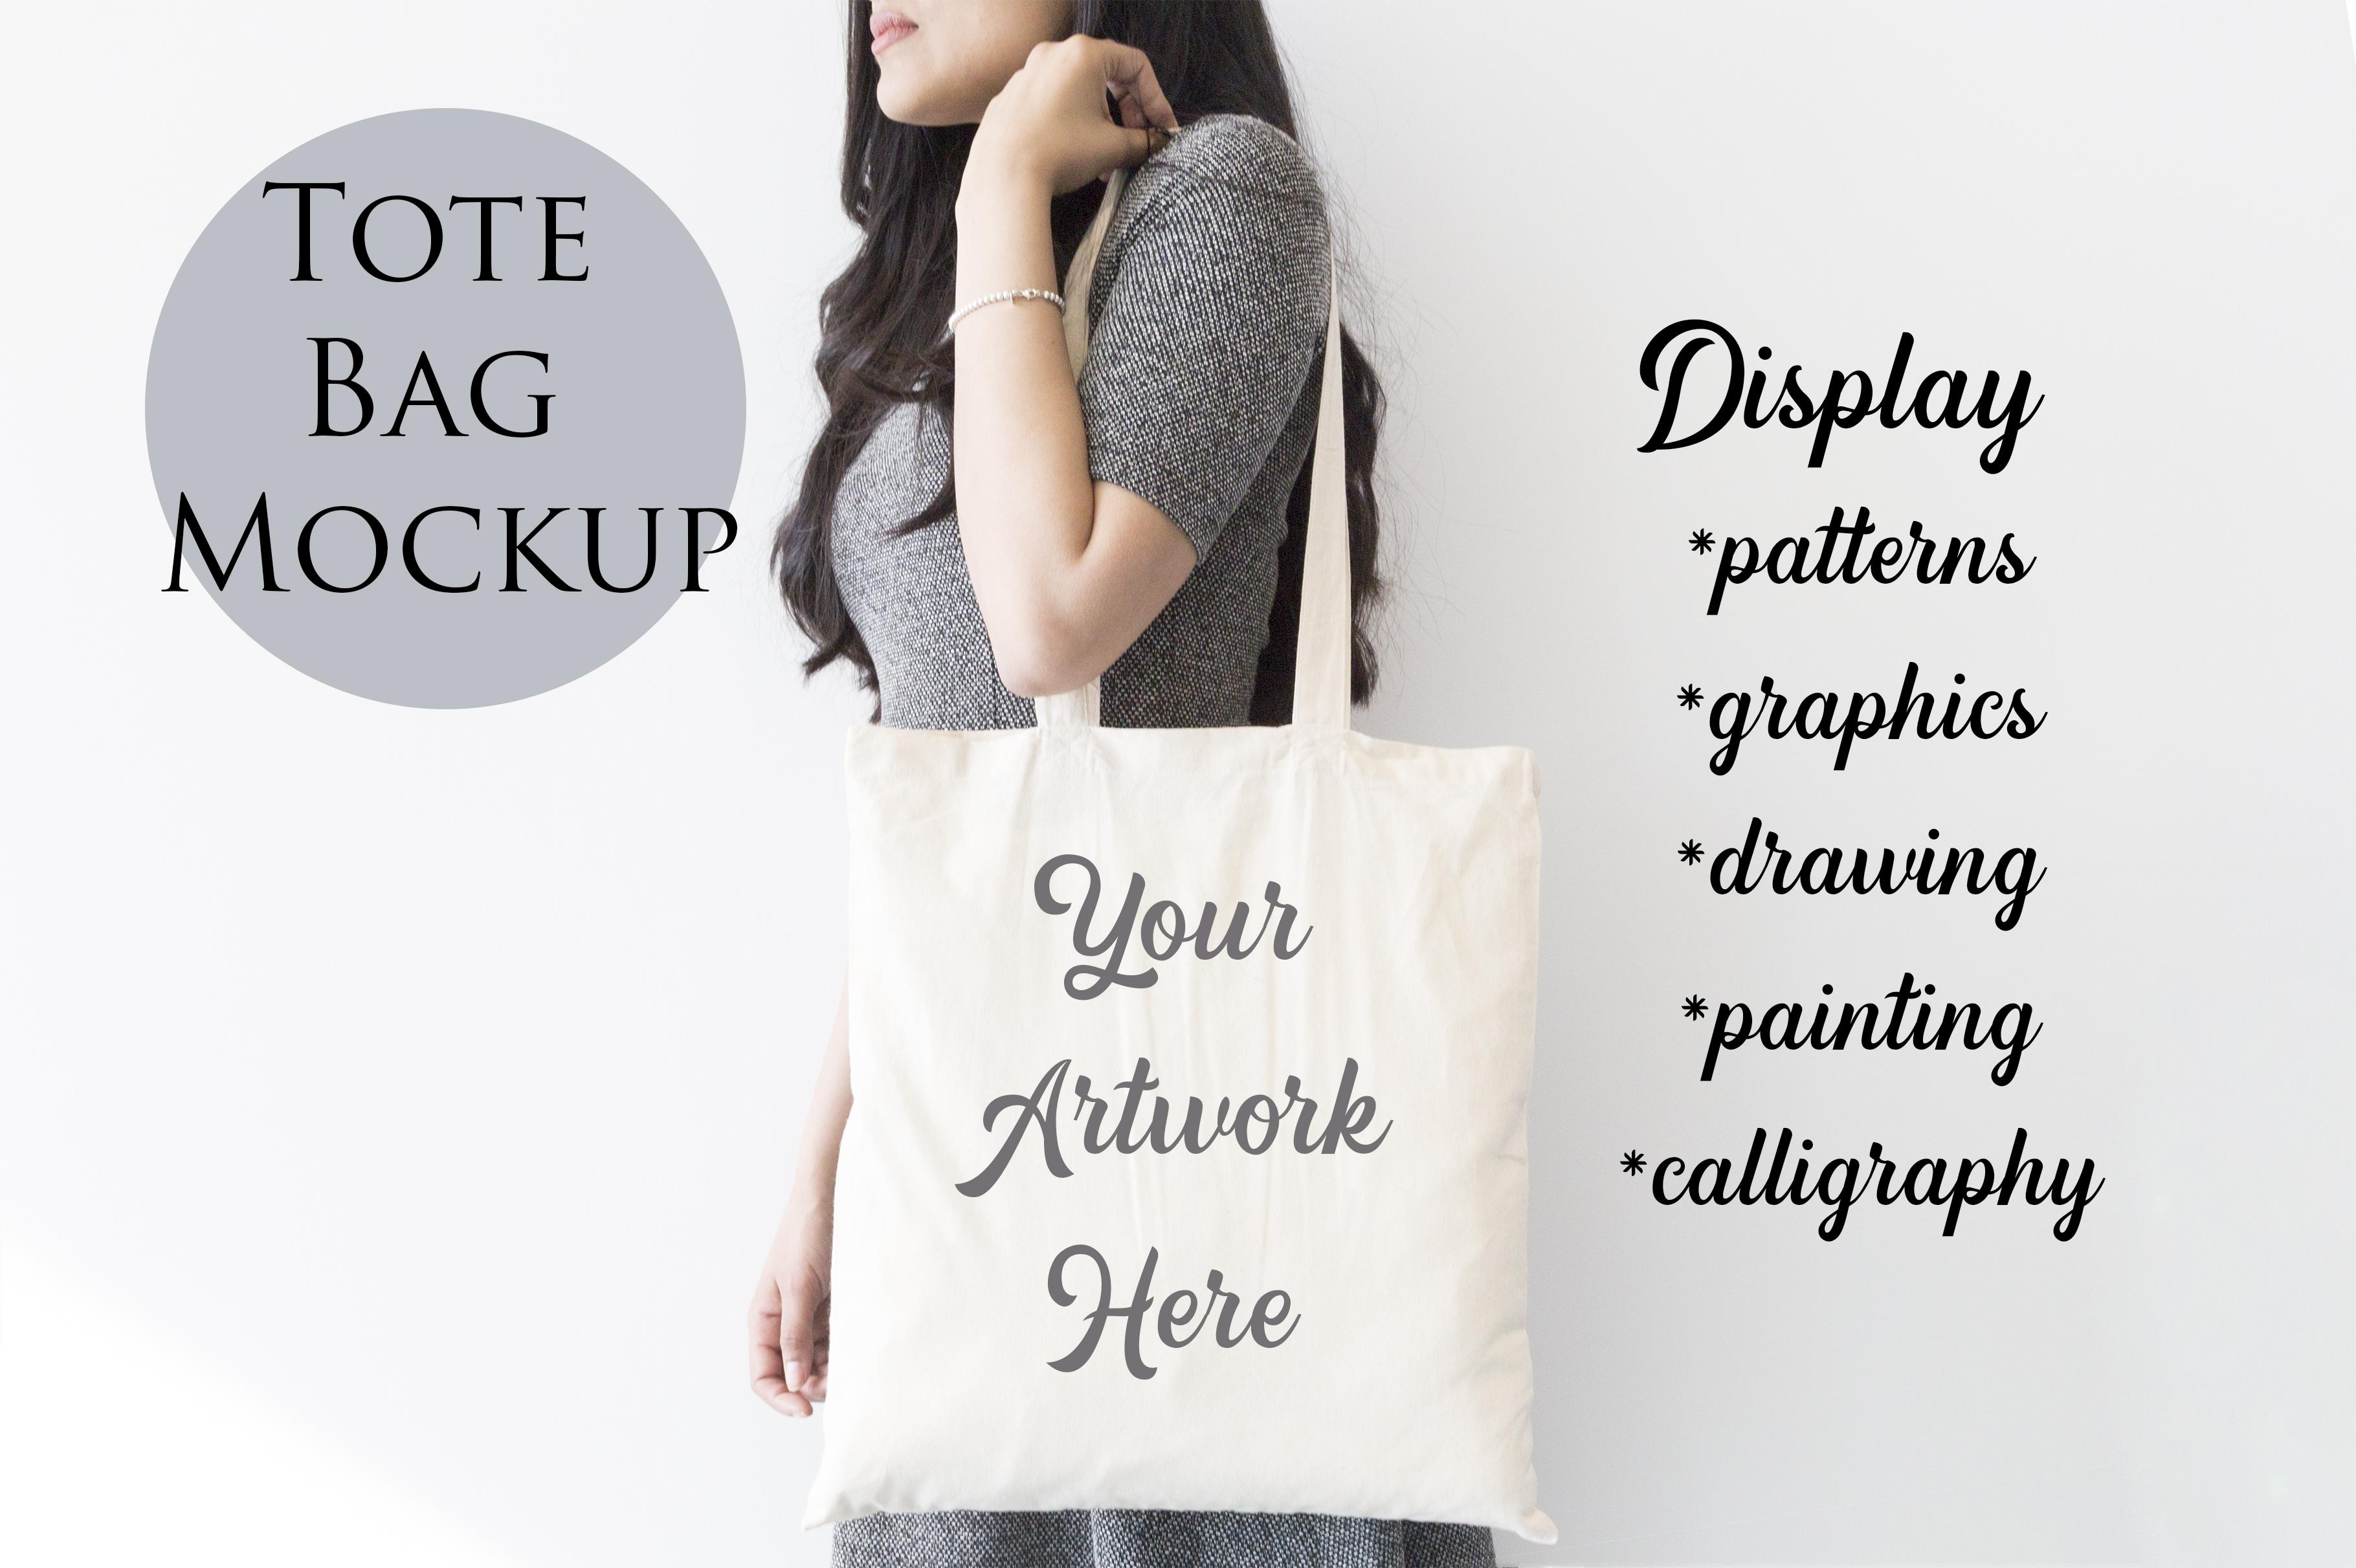 Tote Bag Mockup example image 3